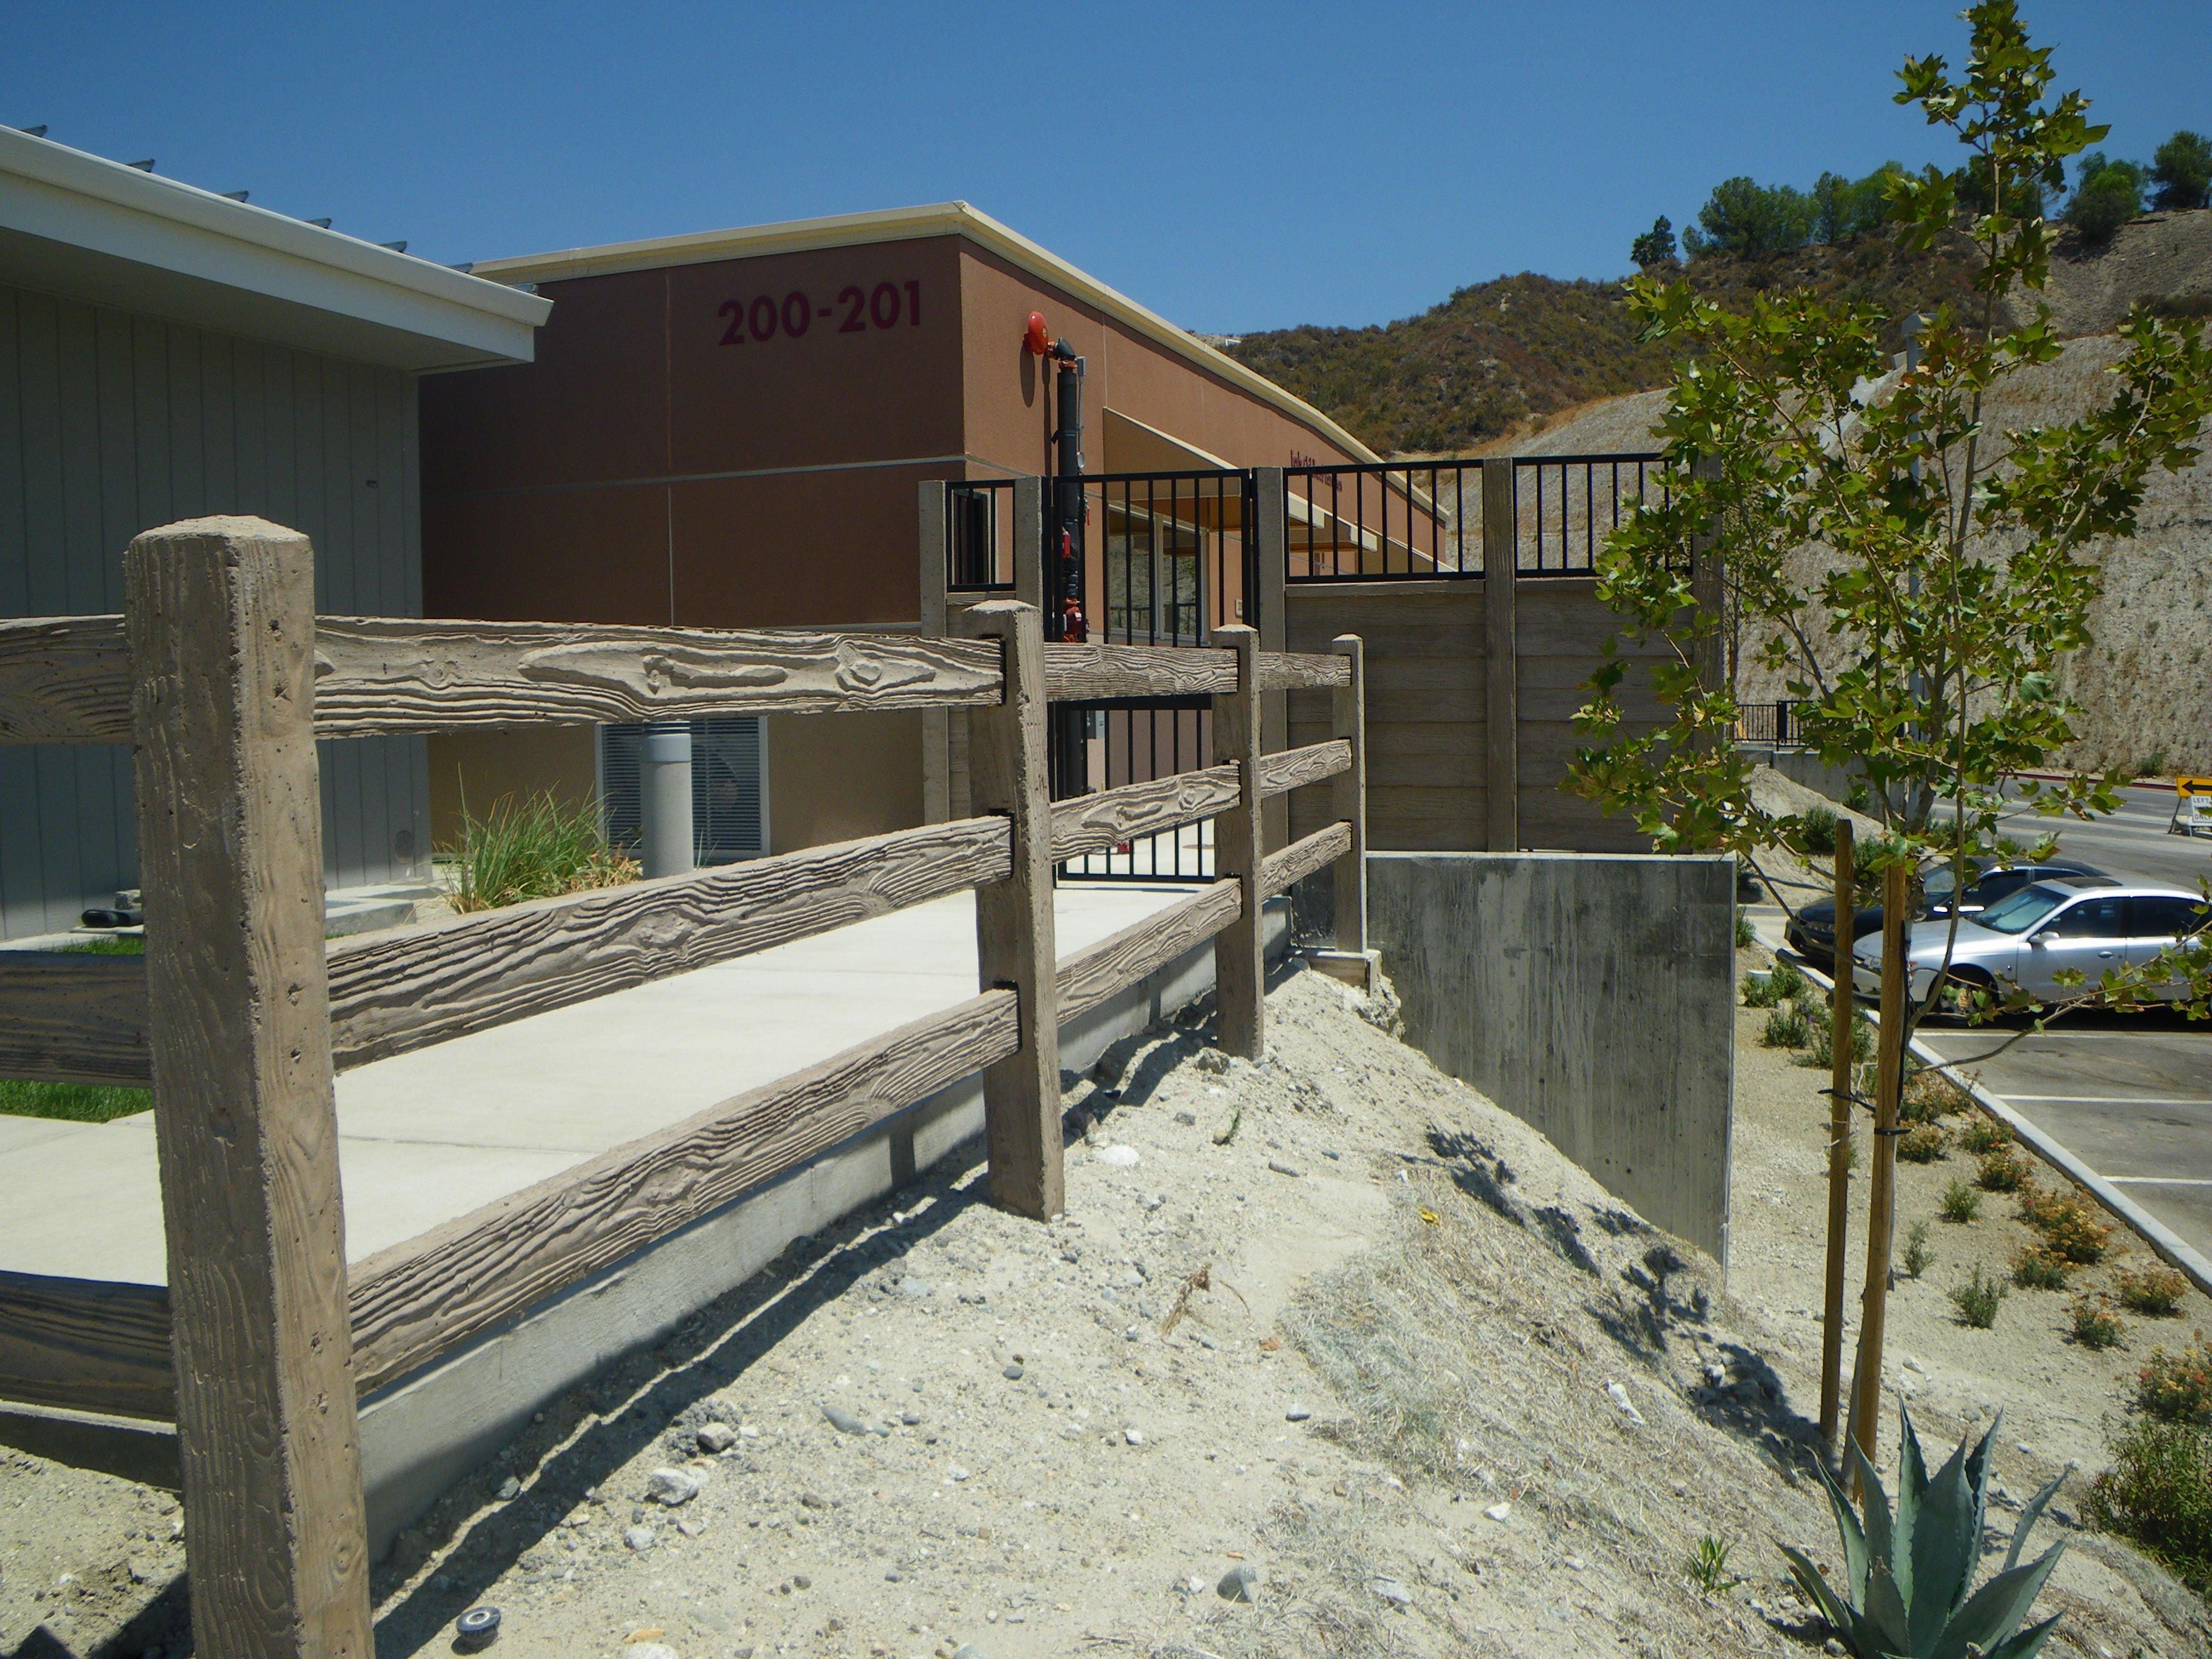 concrete rail fence at school